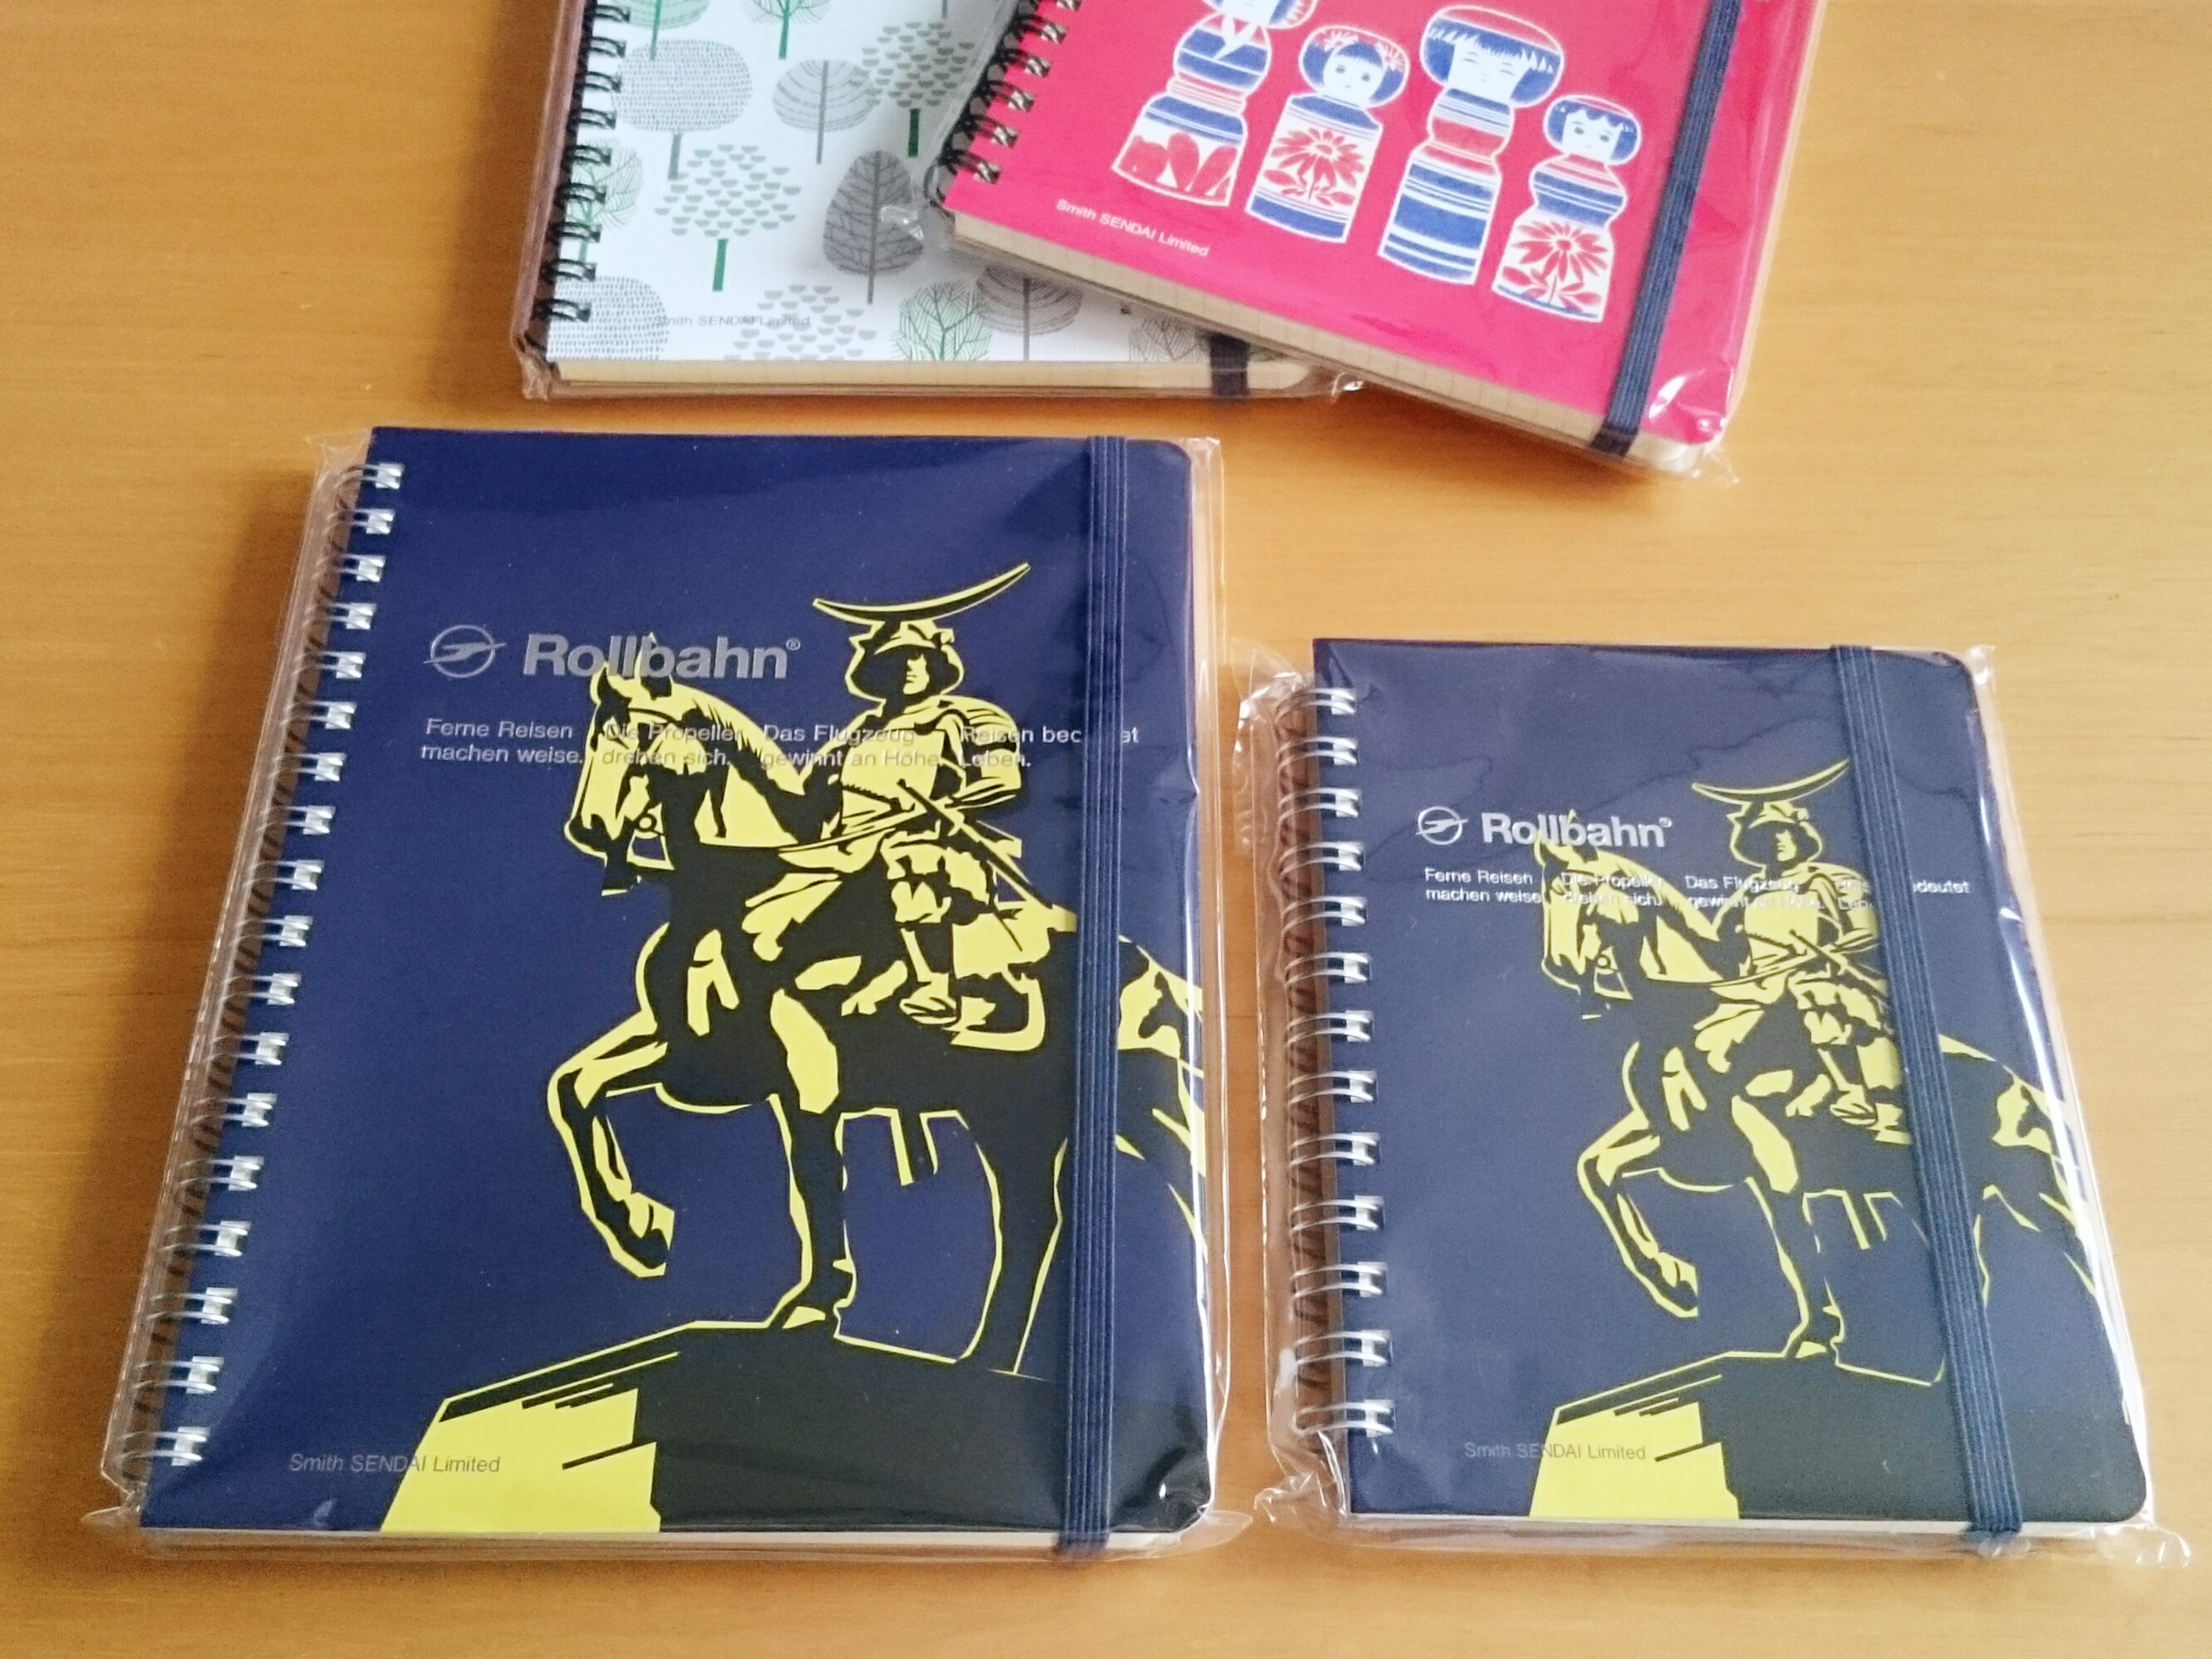 【Stationery】仙台限定☆ロルバーンのノート